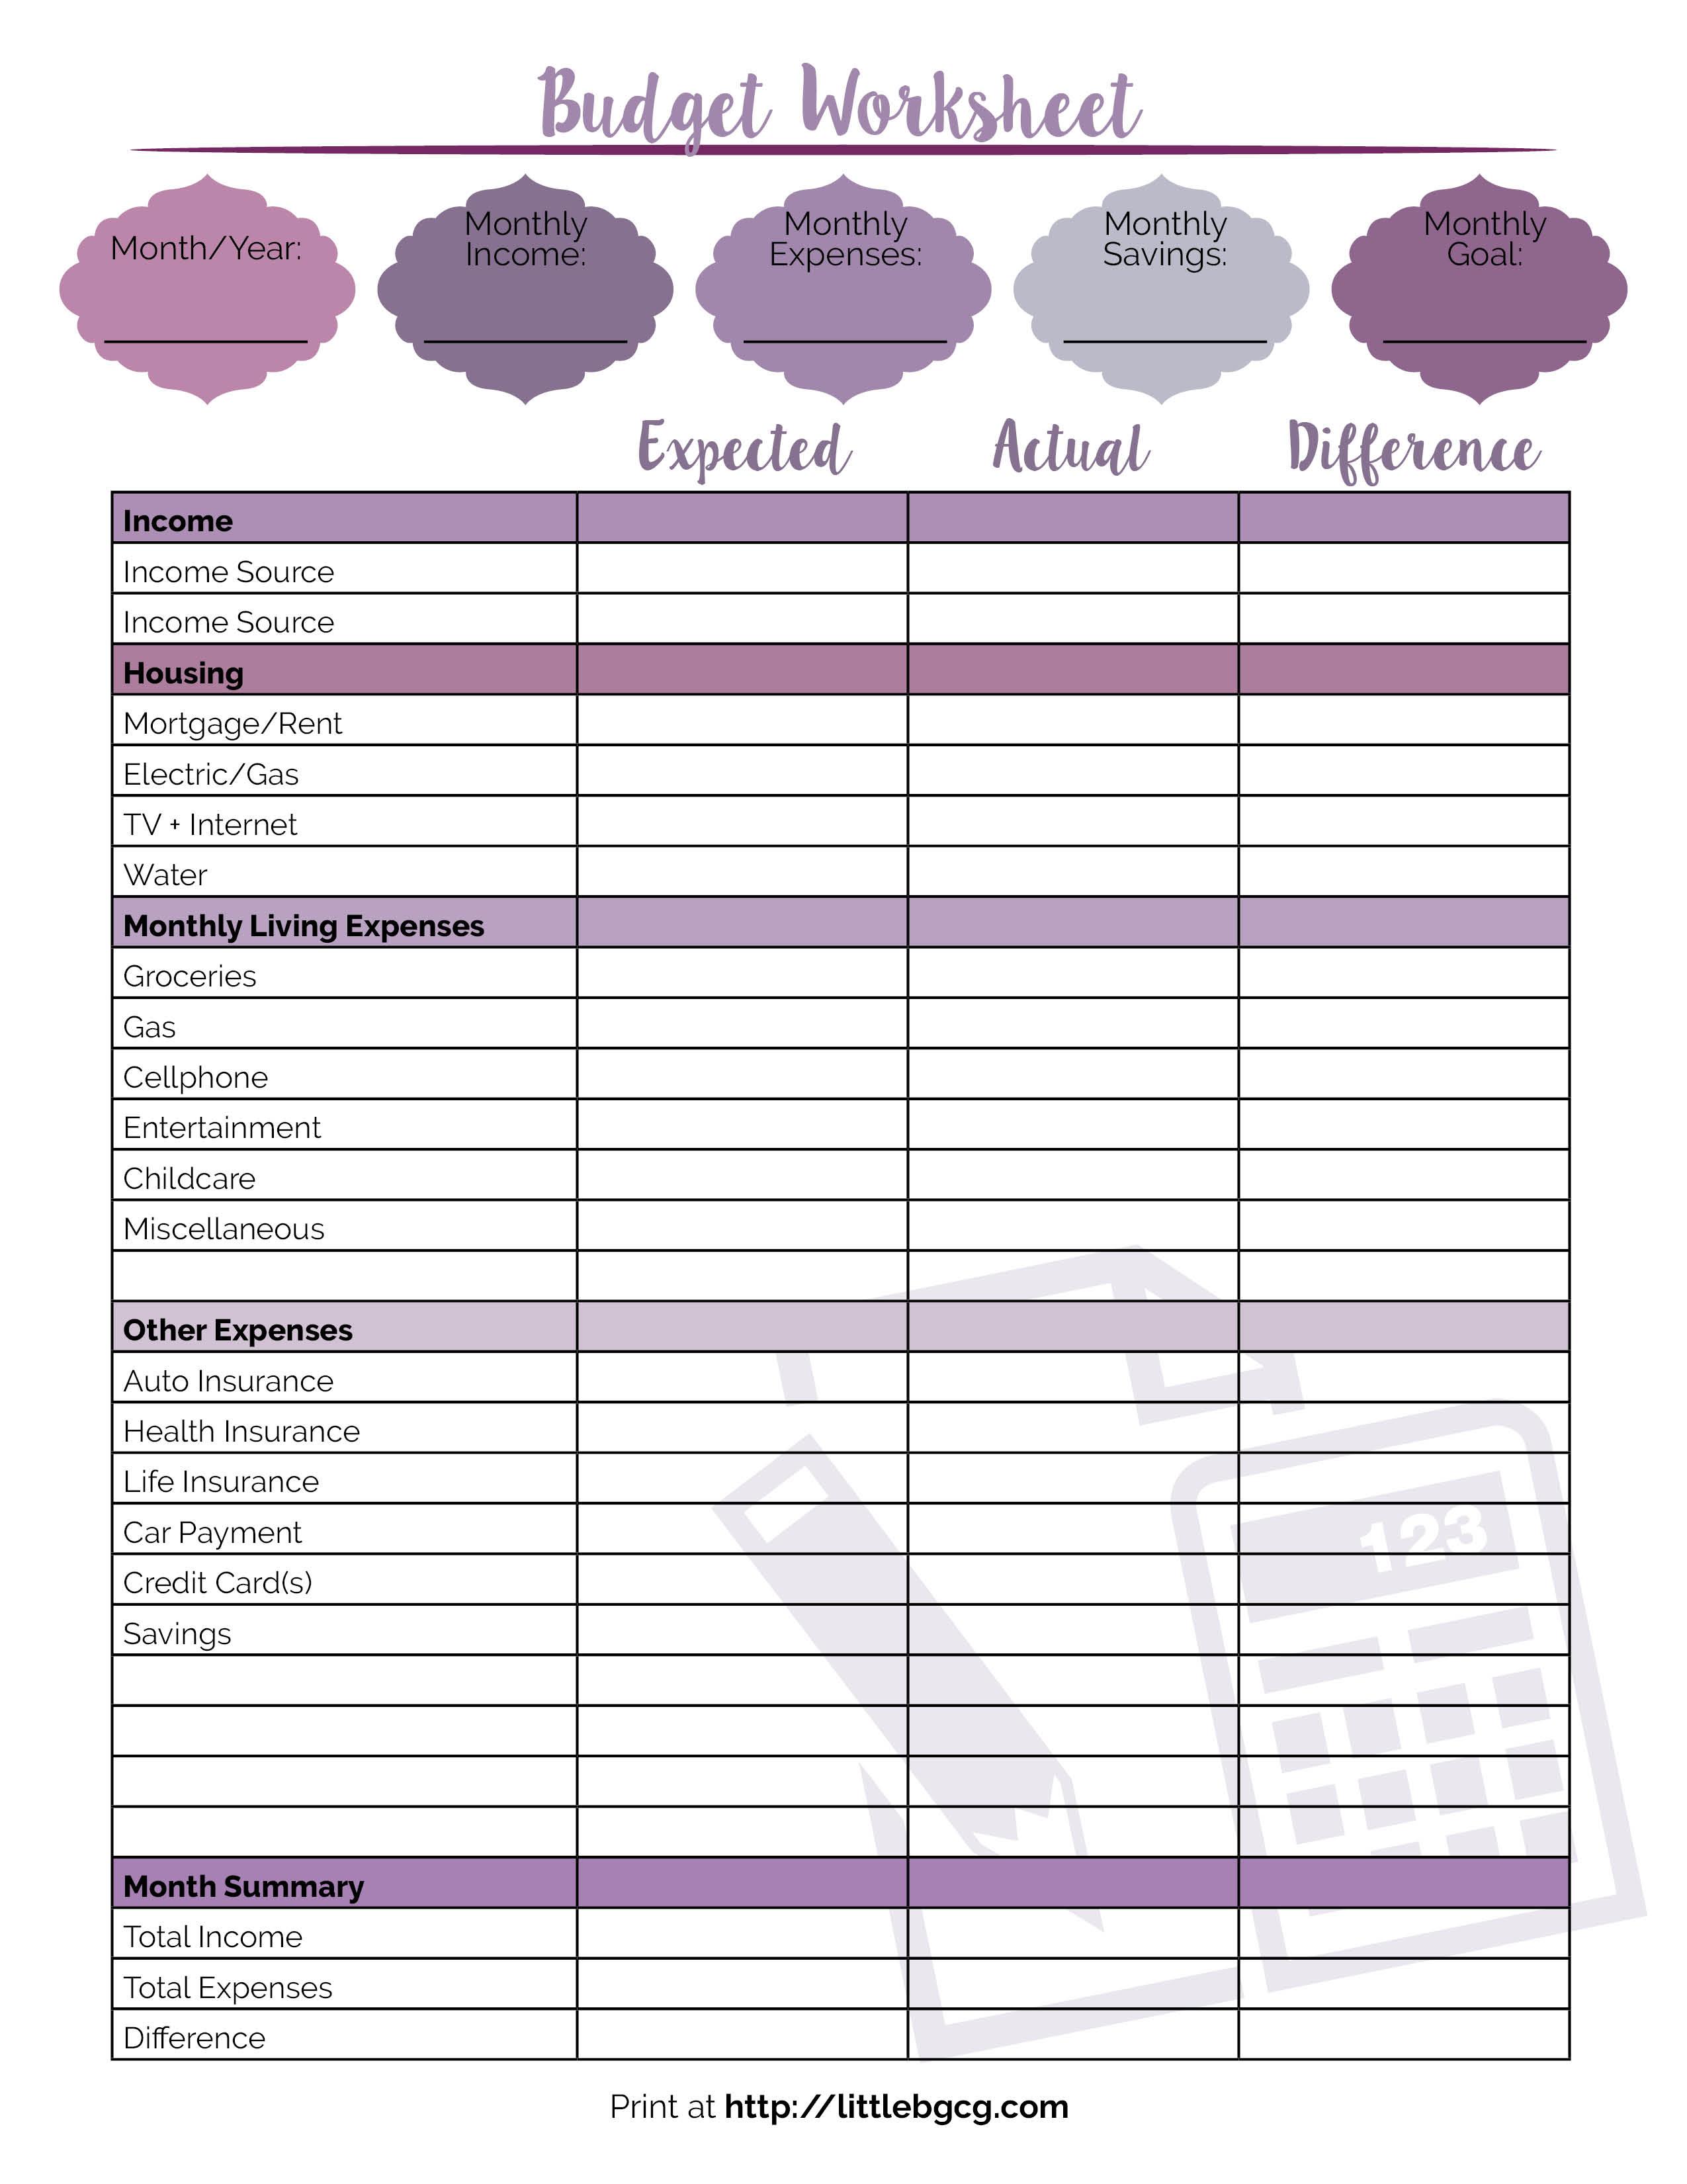 Printable Budget Worksheet - Little Us | Printable Budget Worksheet